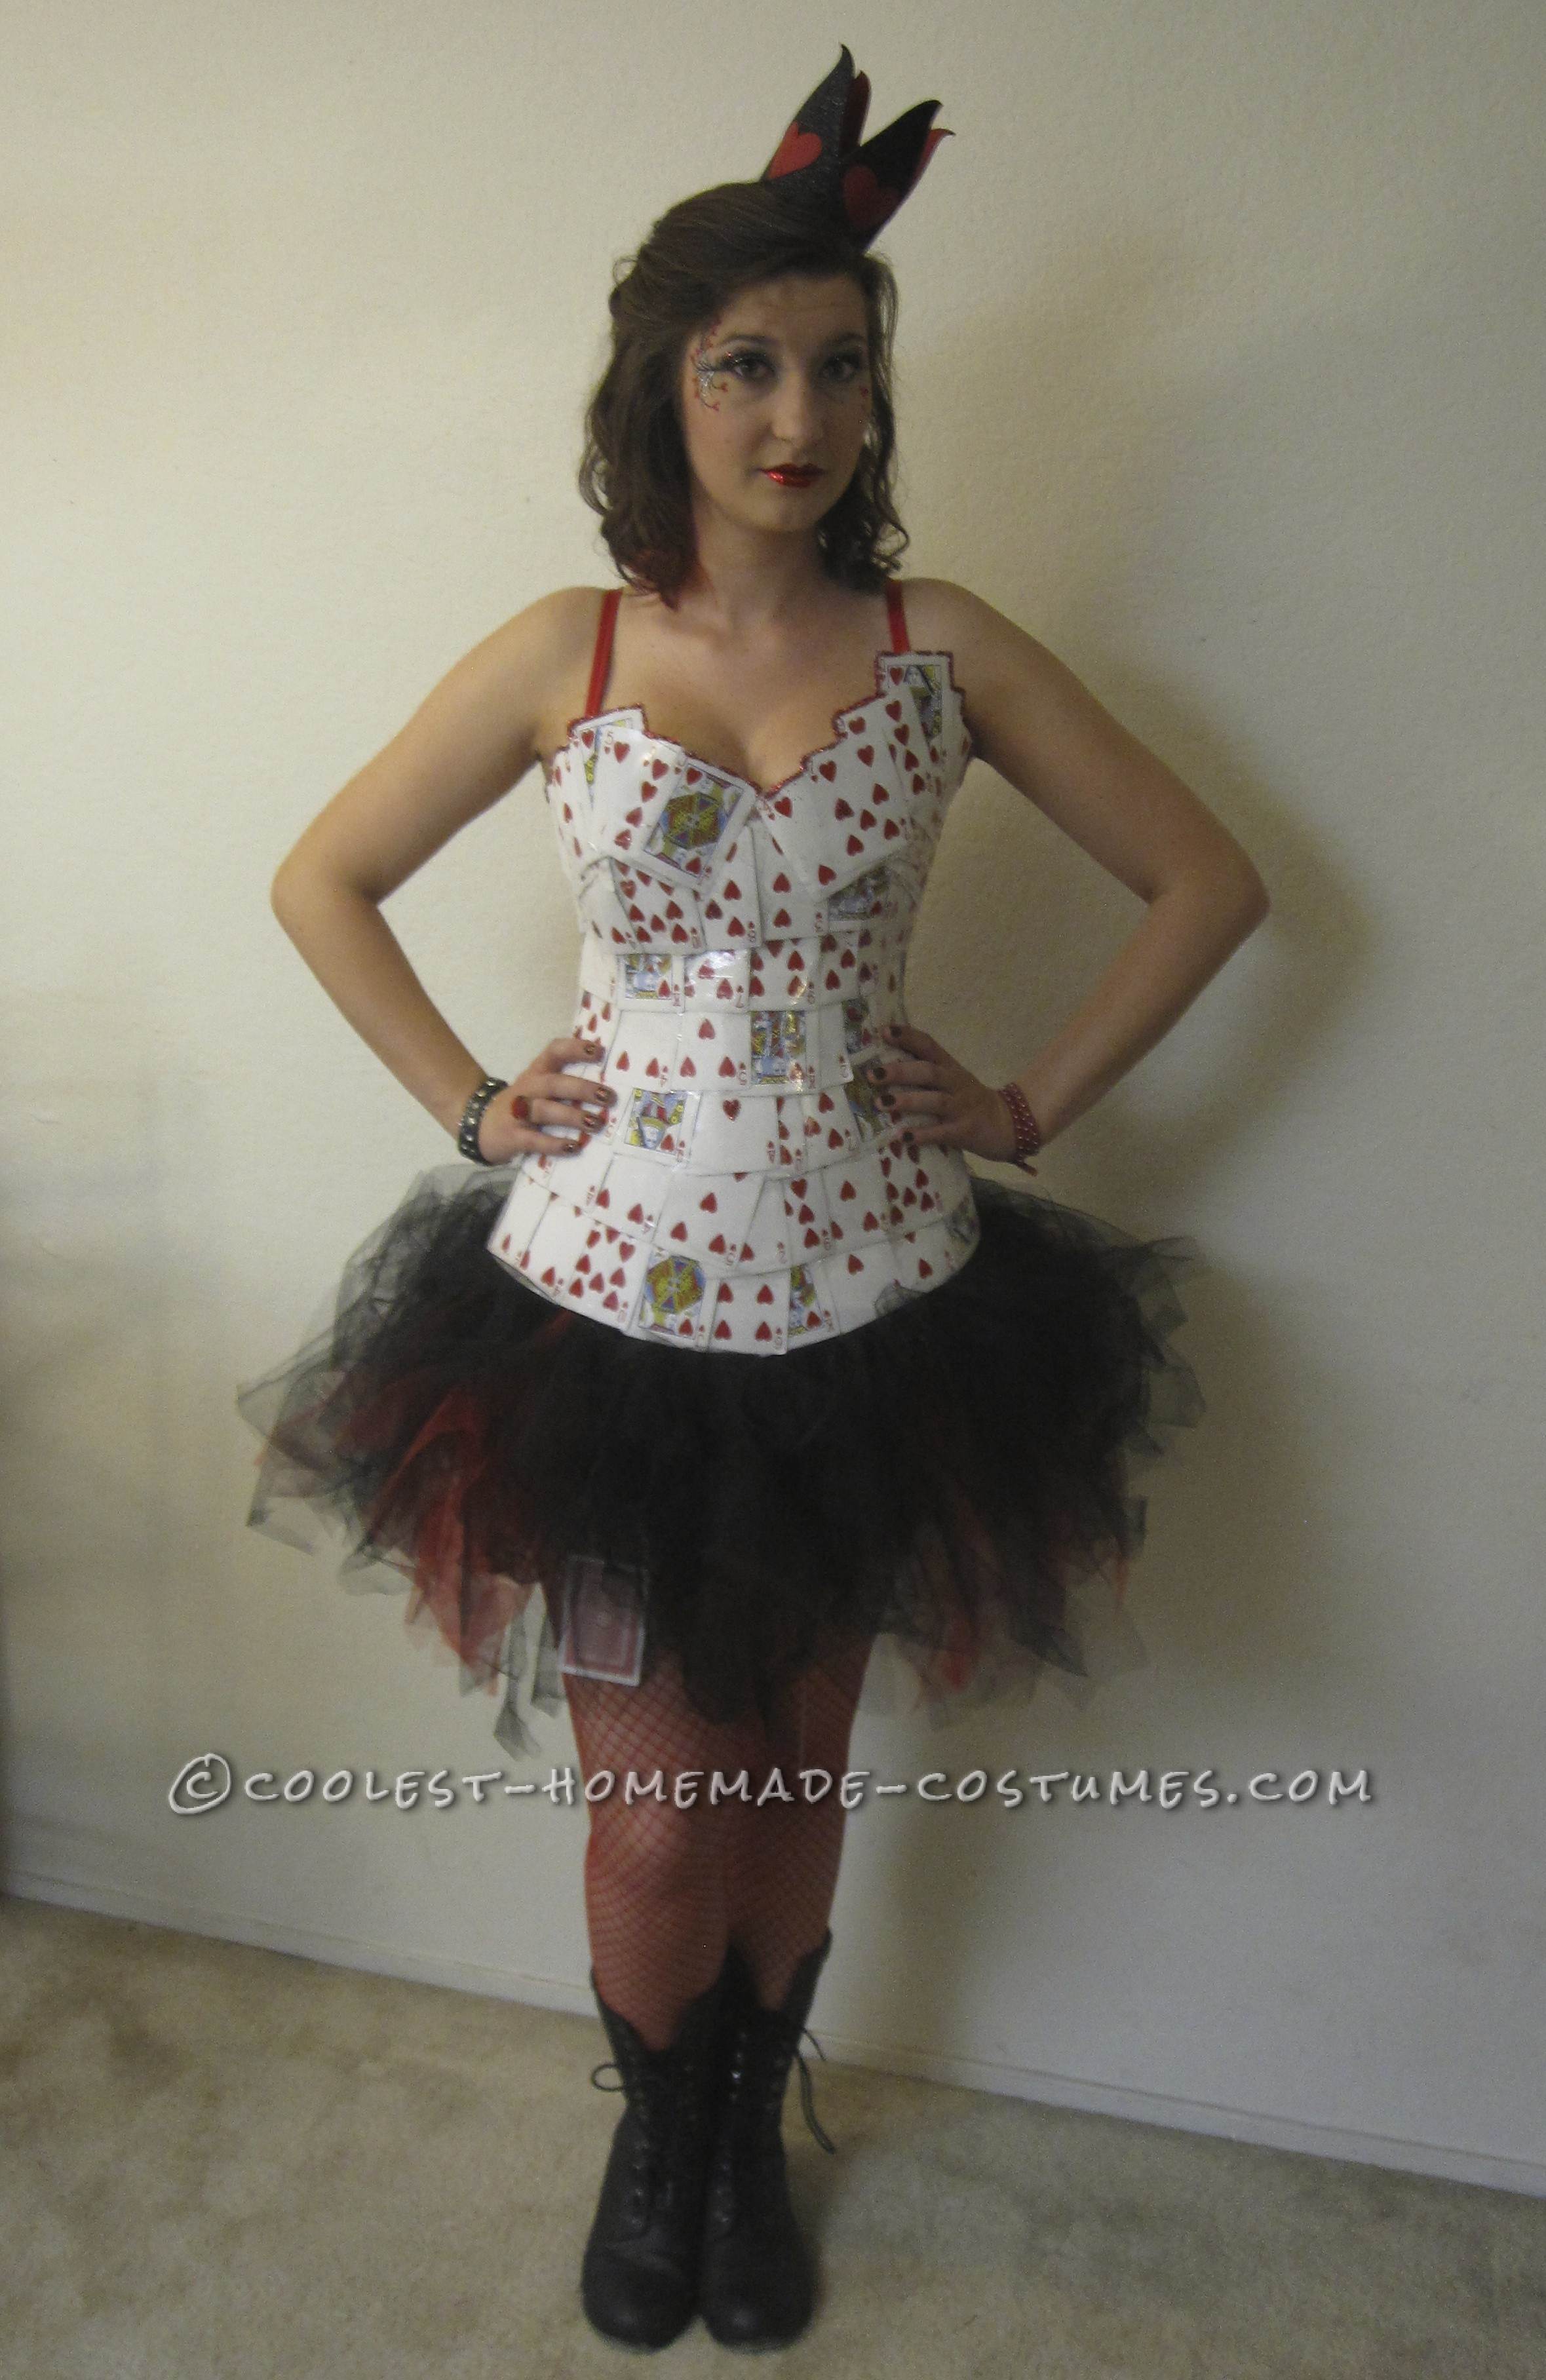 Coolest Homemade Queen of Hearts Costume